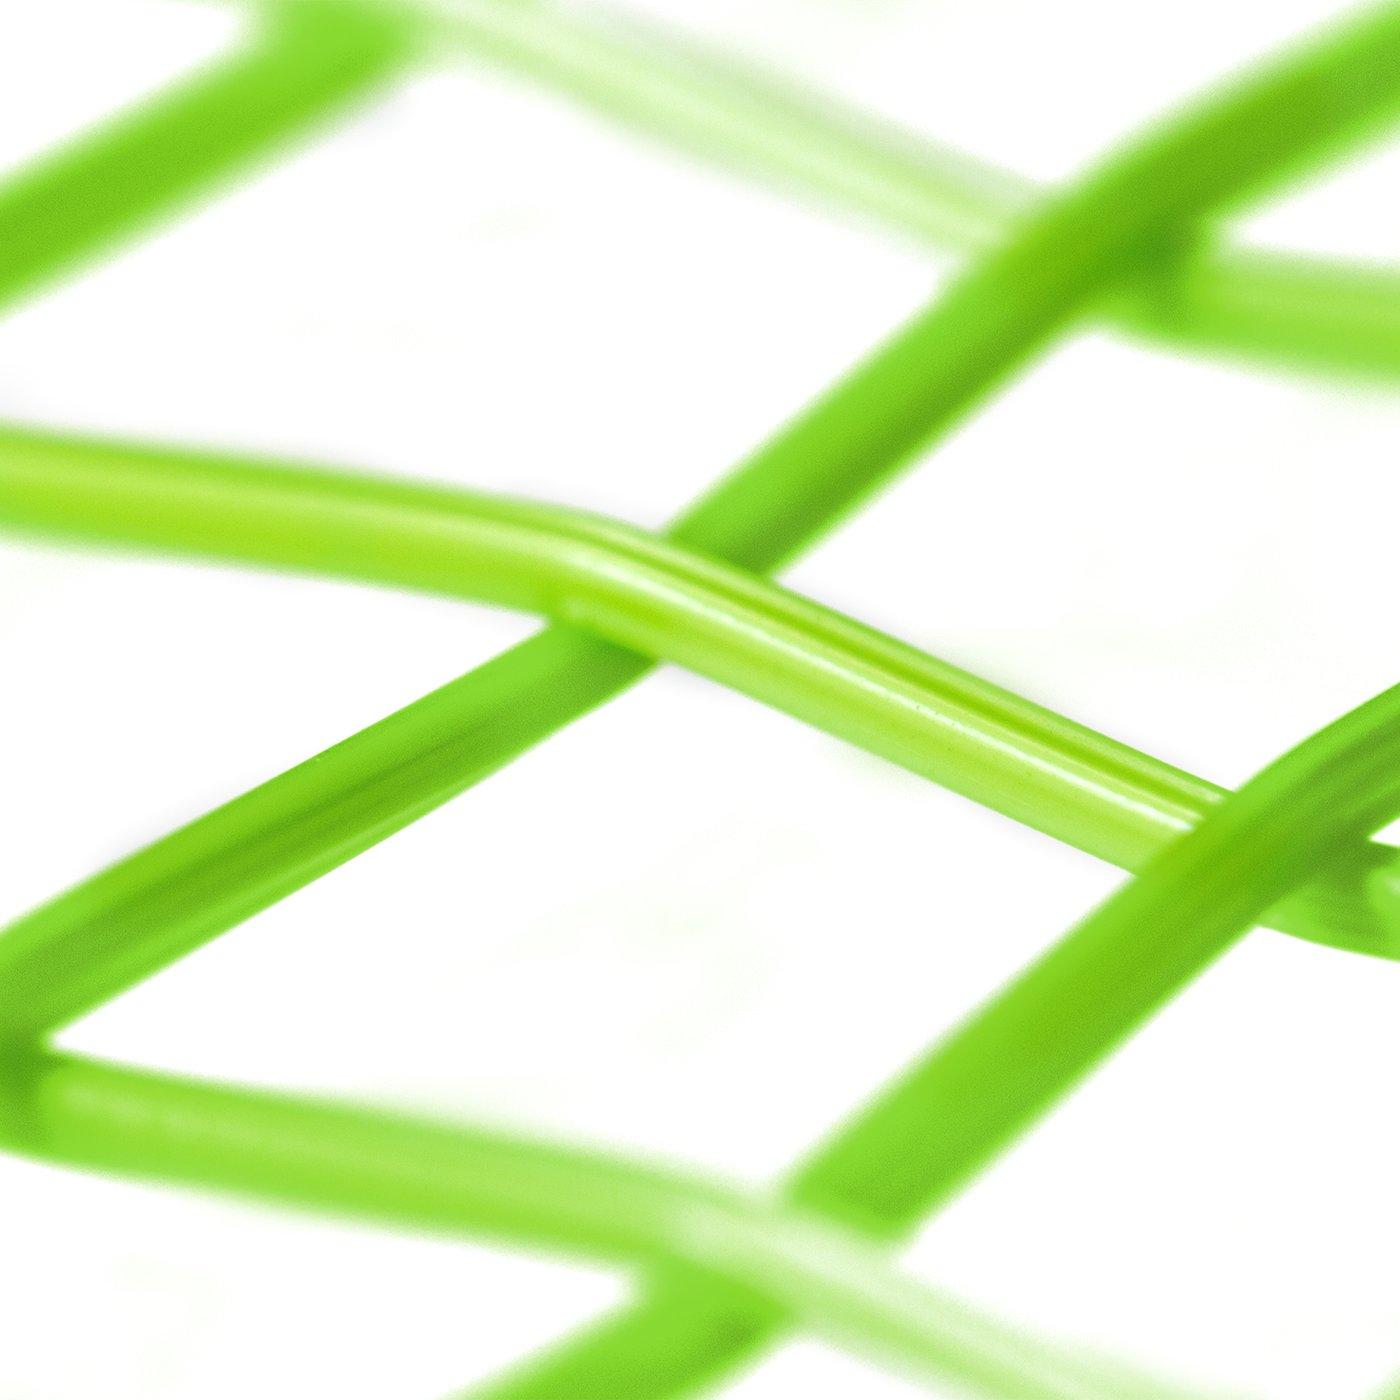 monofilamenti in copoliestere per racchetta da tennis Oehms SONIC Speed rullo da 200/m /Ø 1,19//1,24/mm